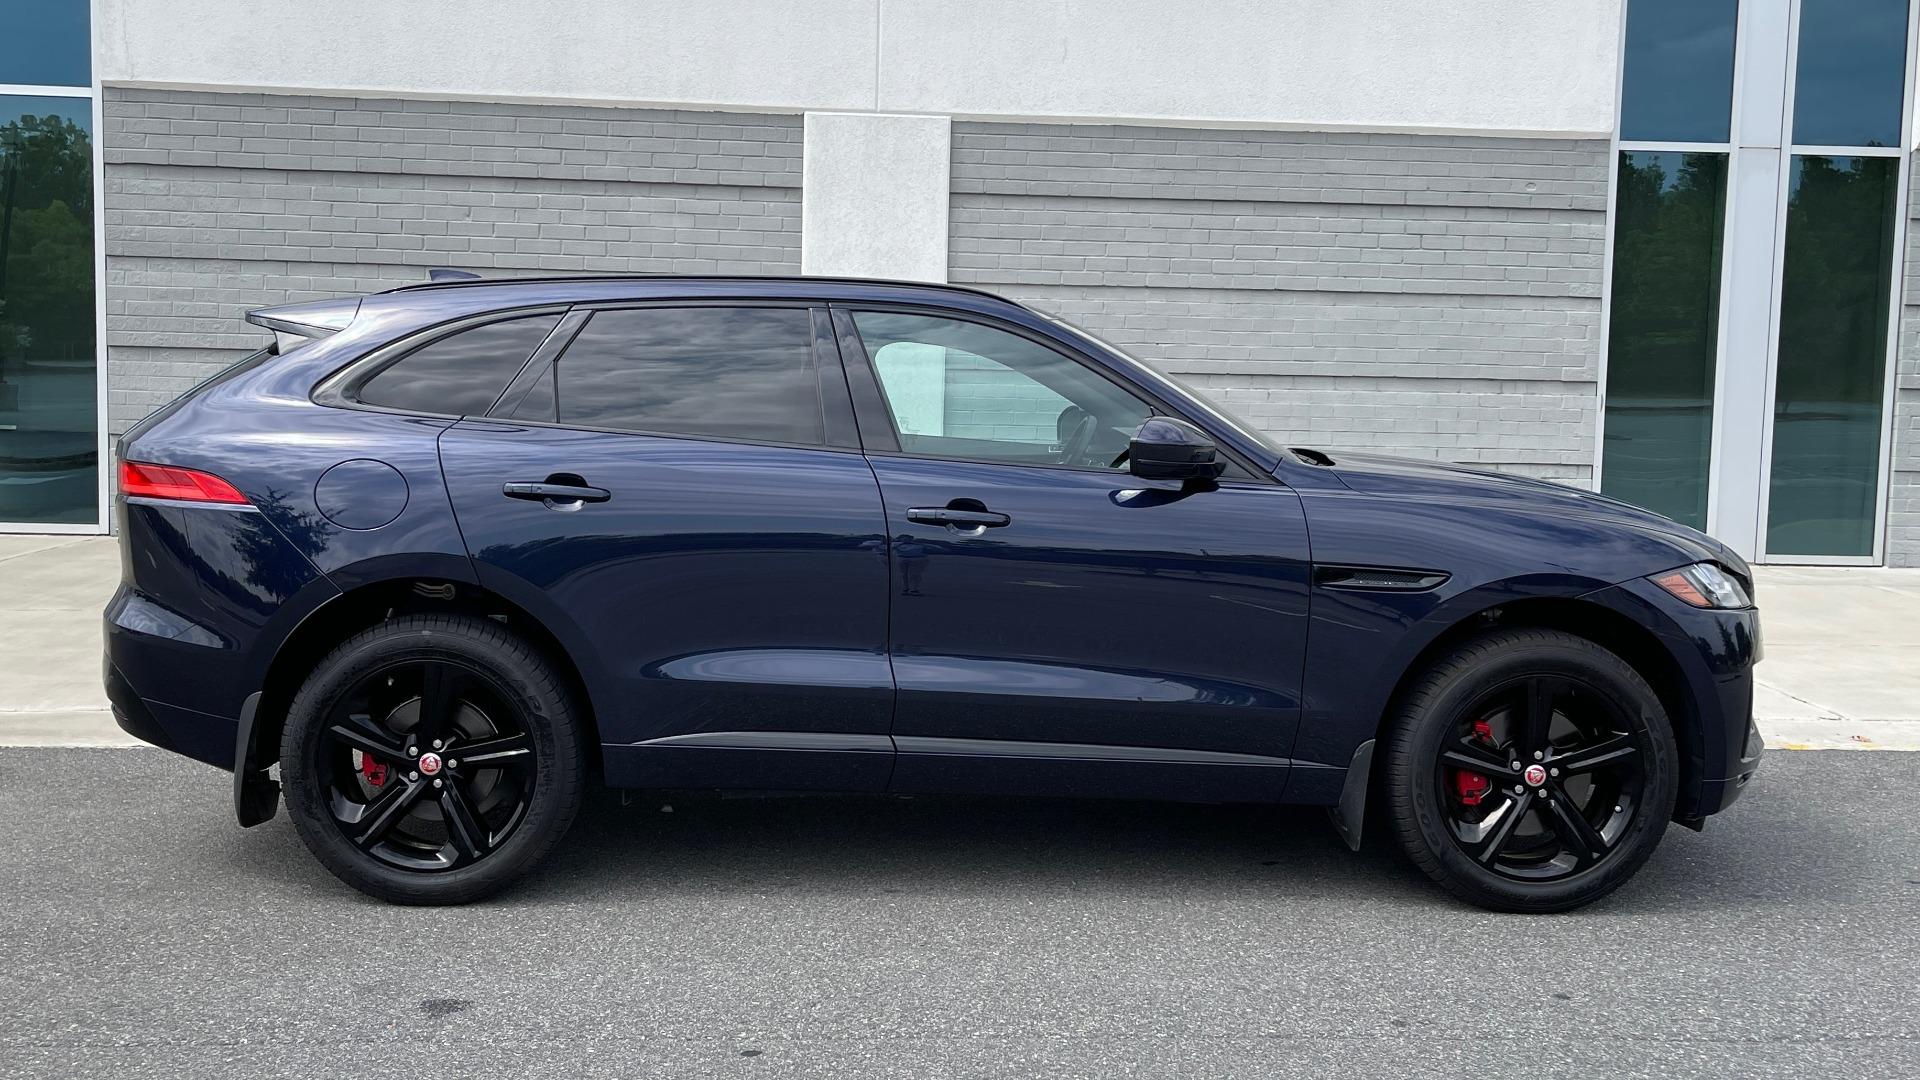 Used 2019 Jaguar F-PACE S / DRIVE PKG / BSA / HUD / BLACK EXT PKG / REARVIEW for sale $50,995 at Formula Imports in Charlotte NC 28227 7